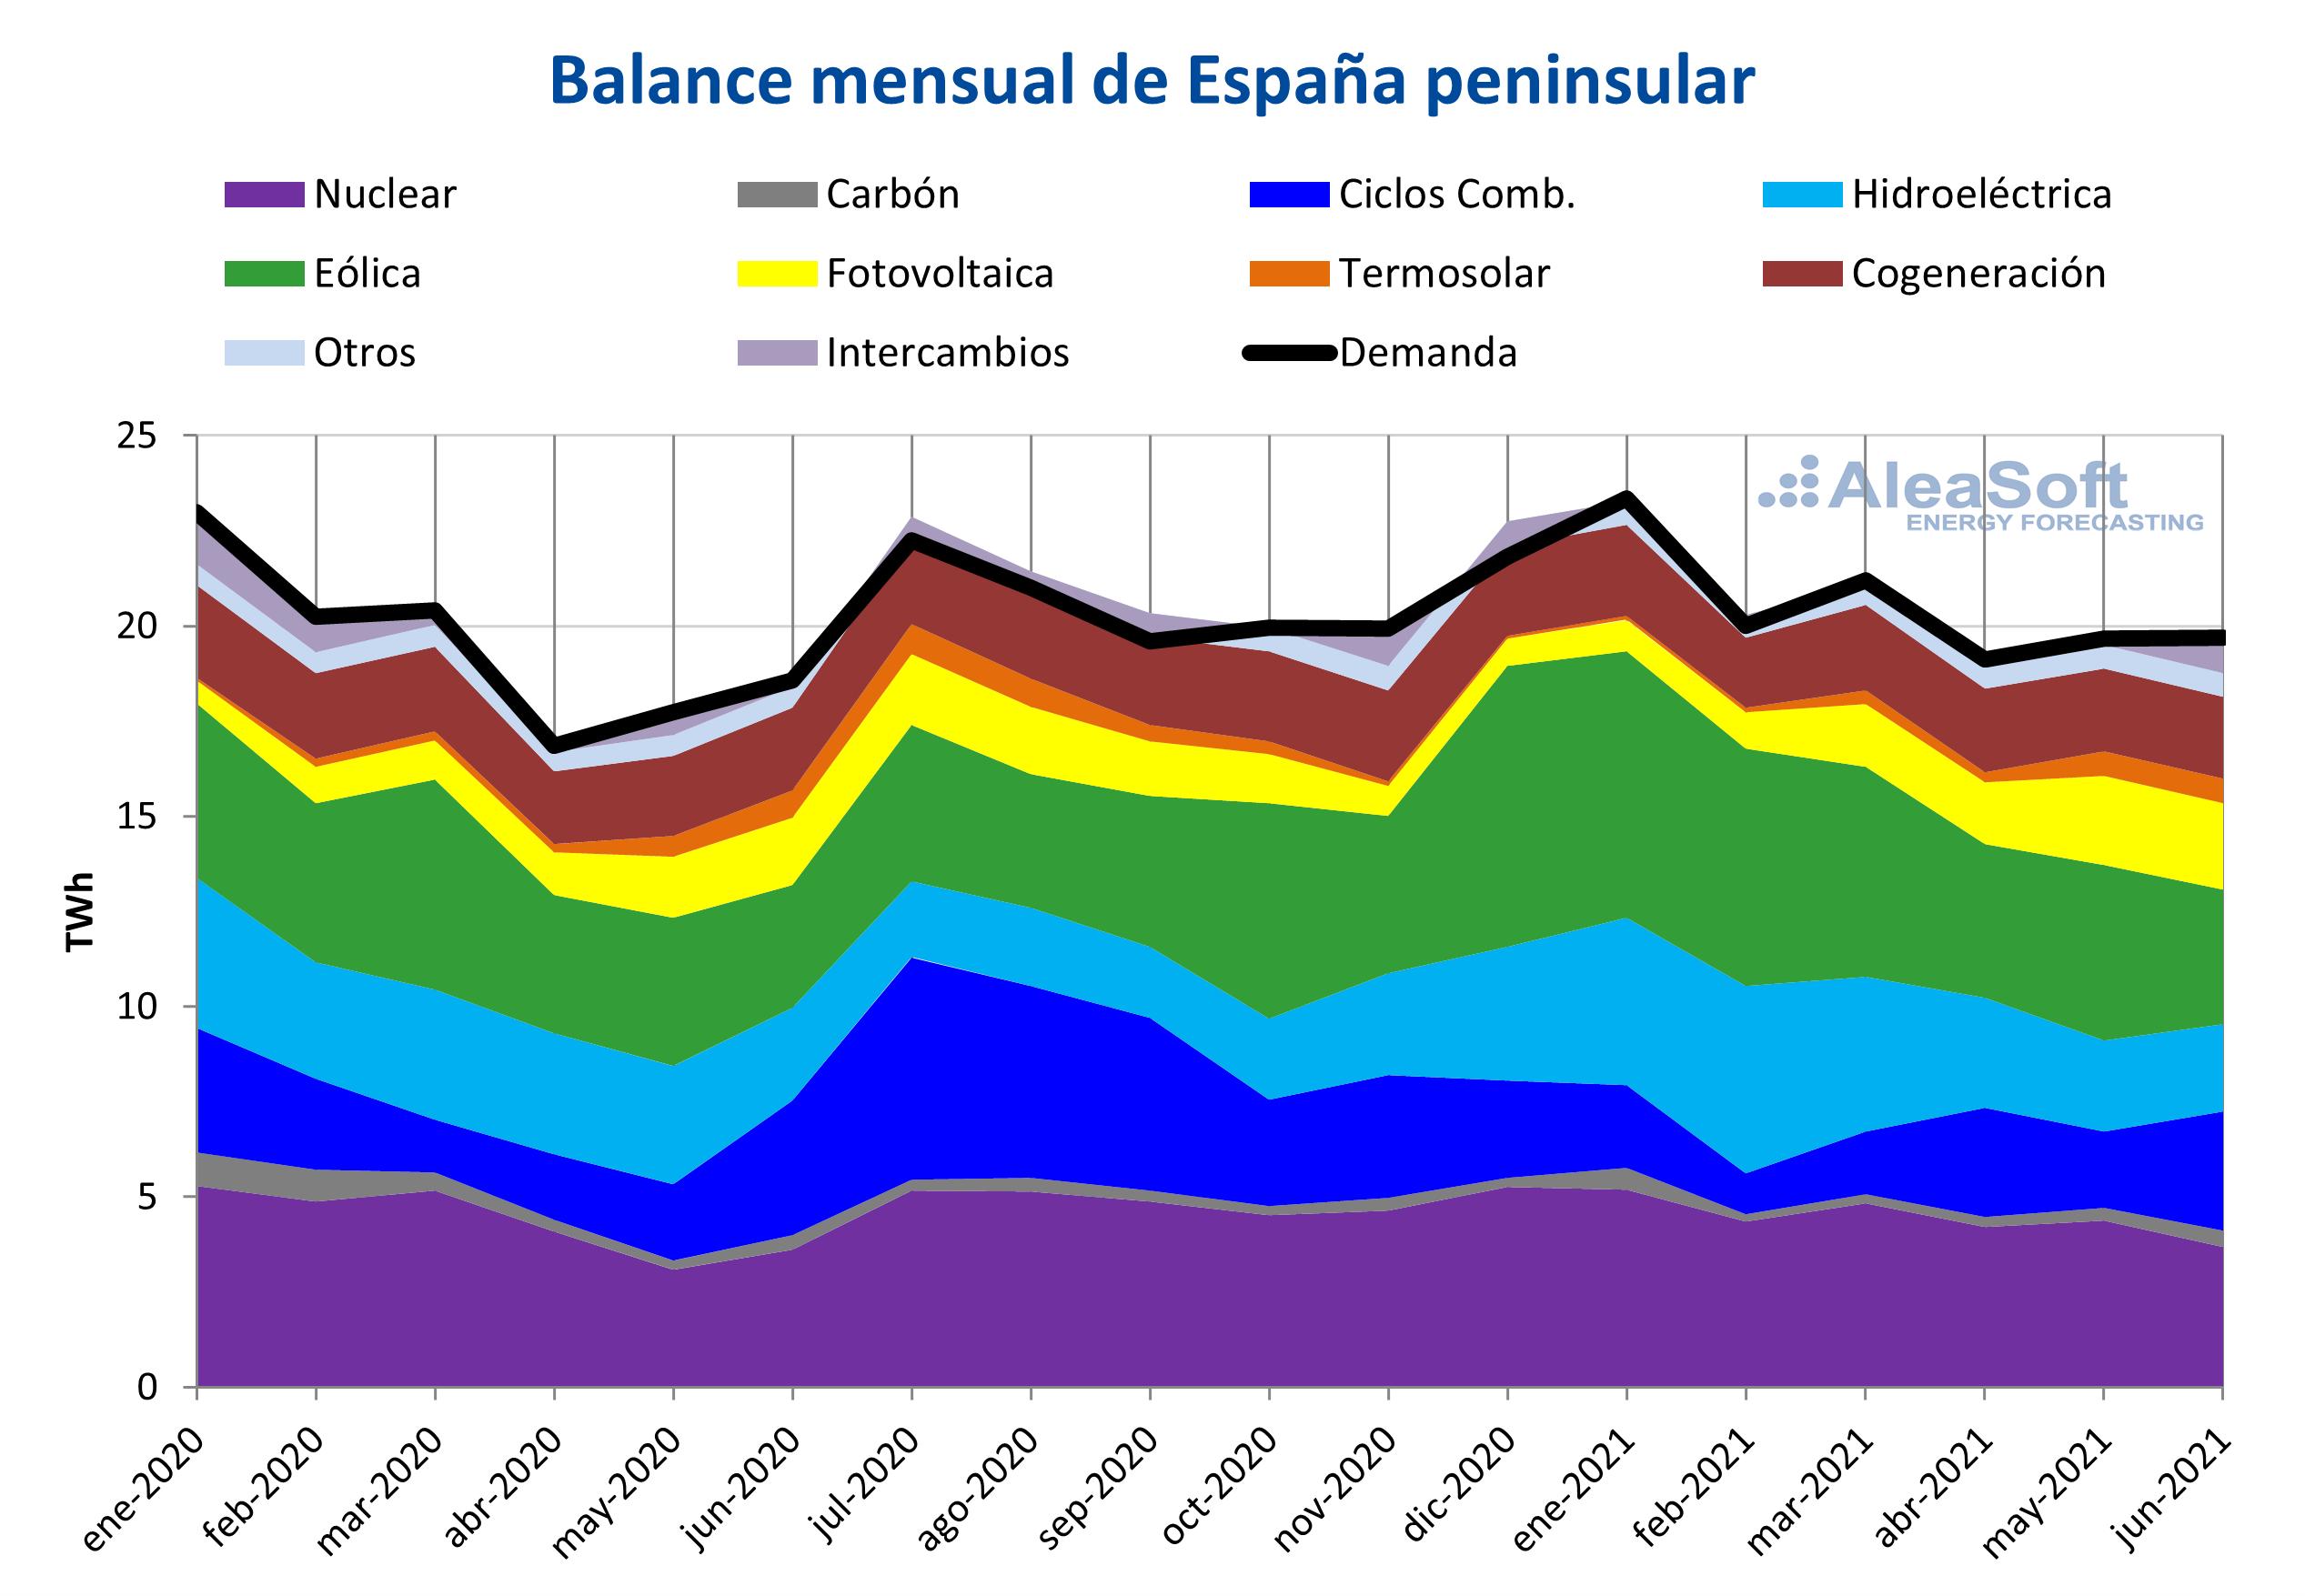 AleaSoft - Balance mensual Espana peninsular